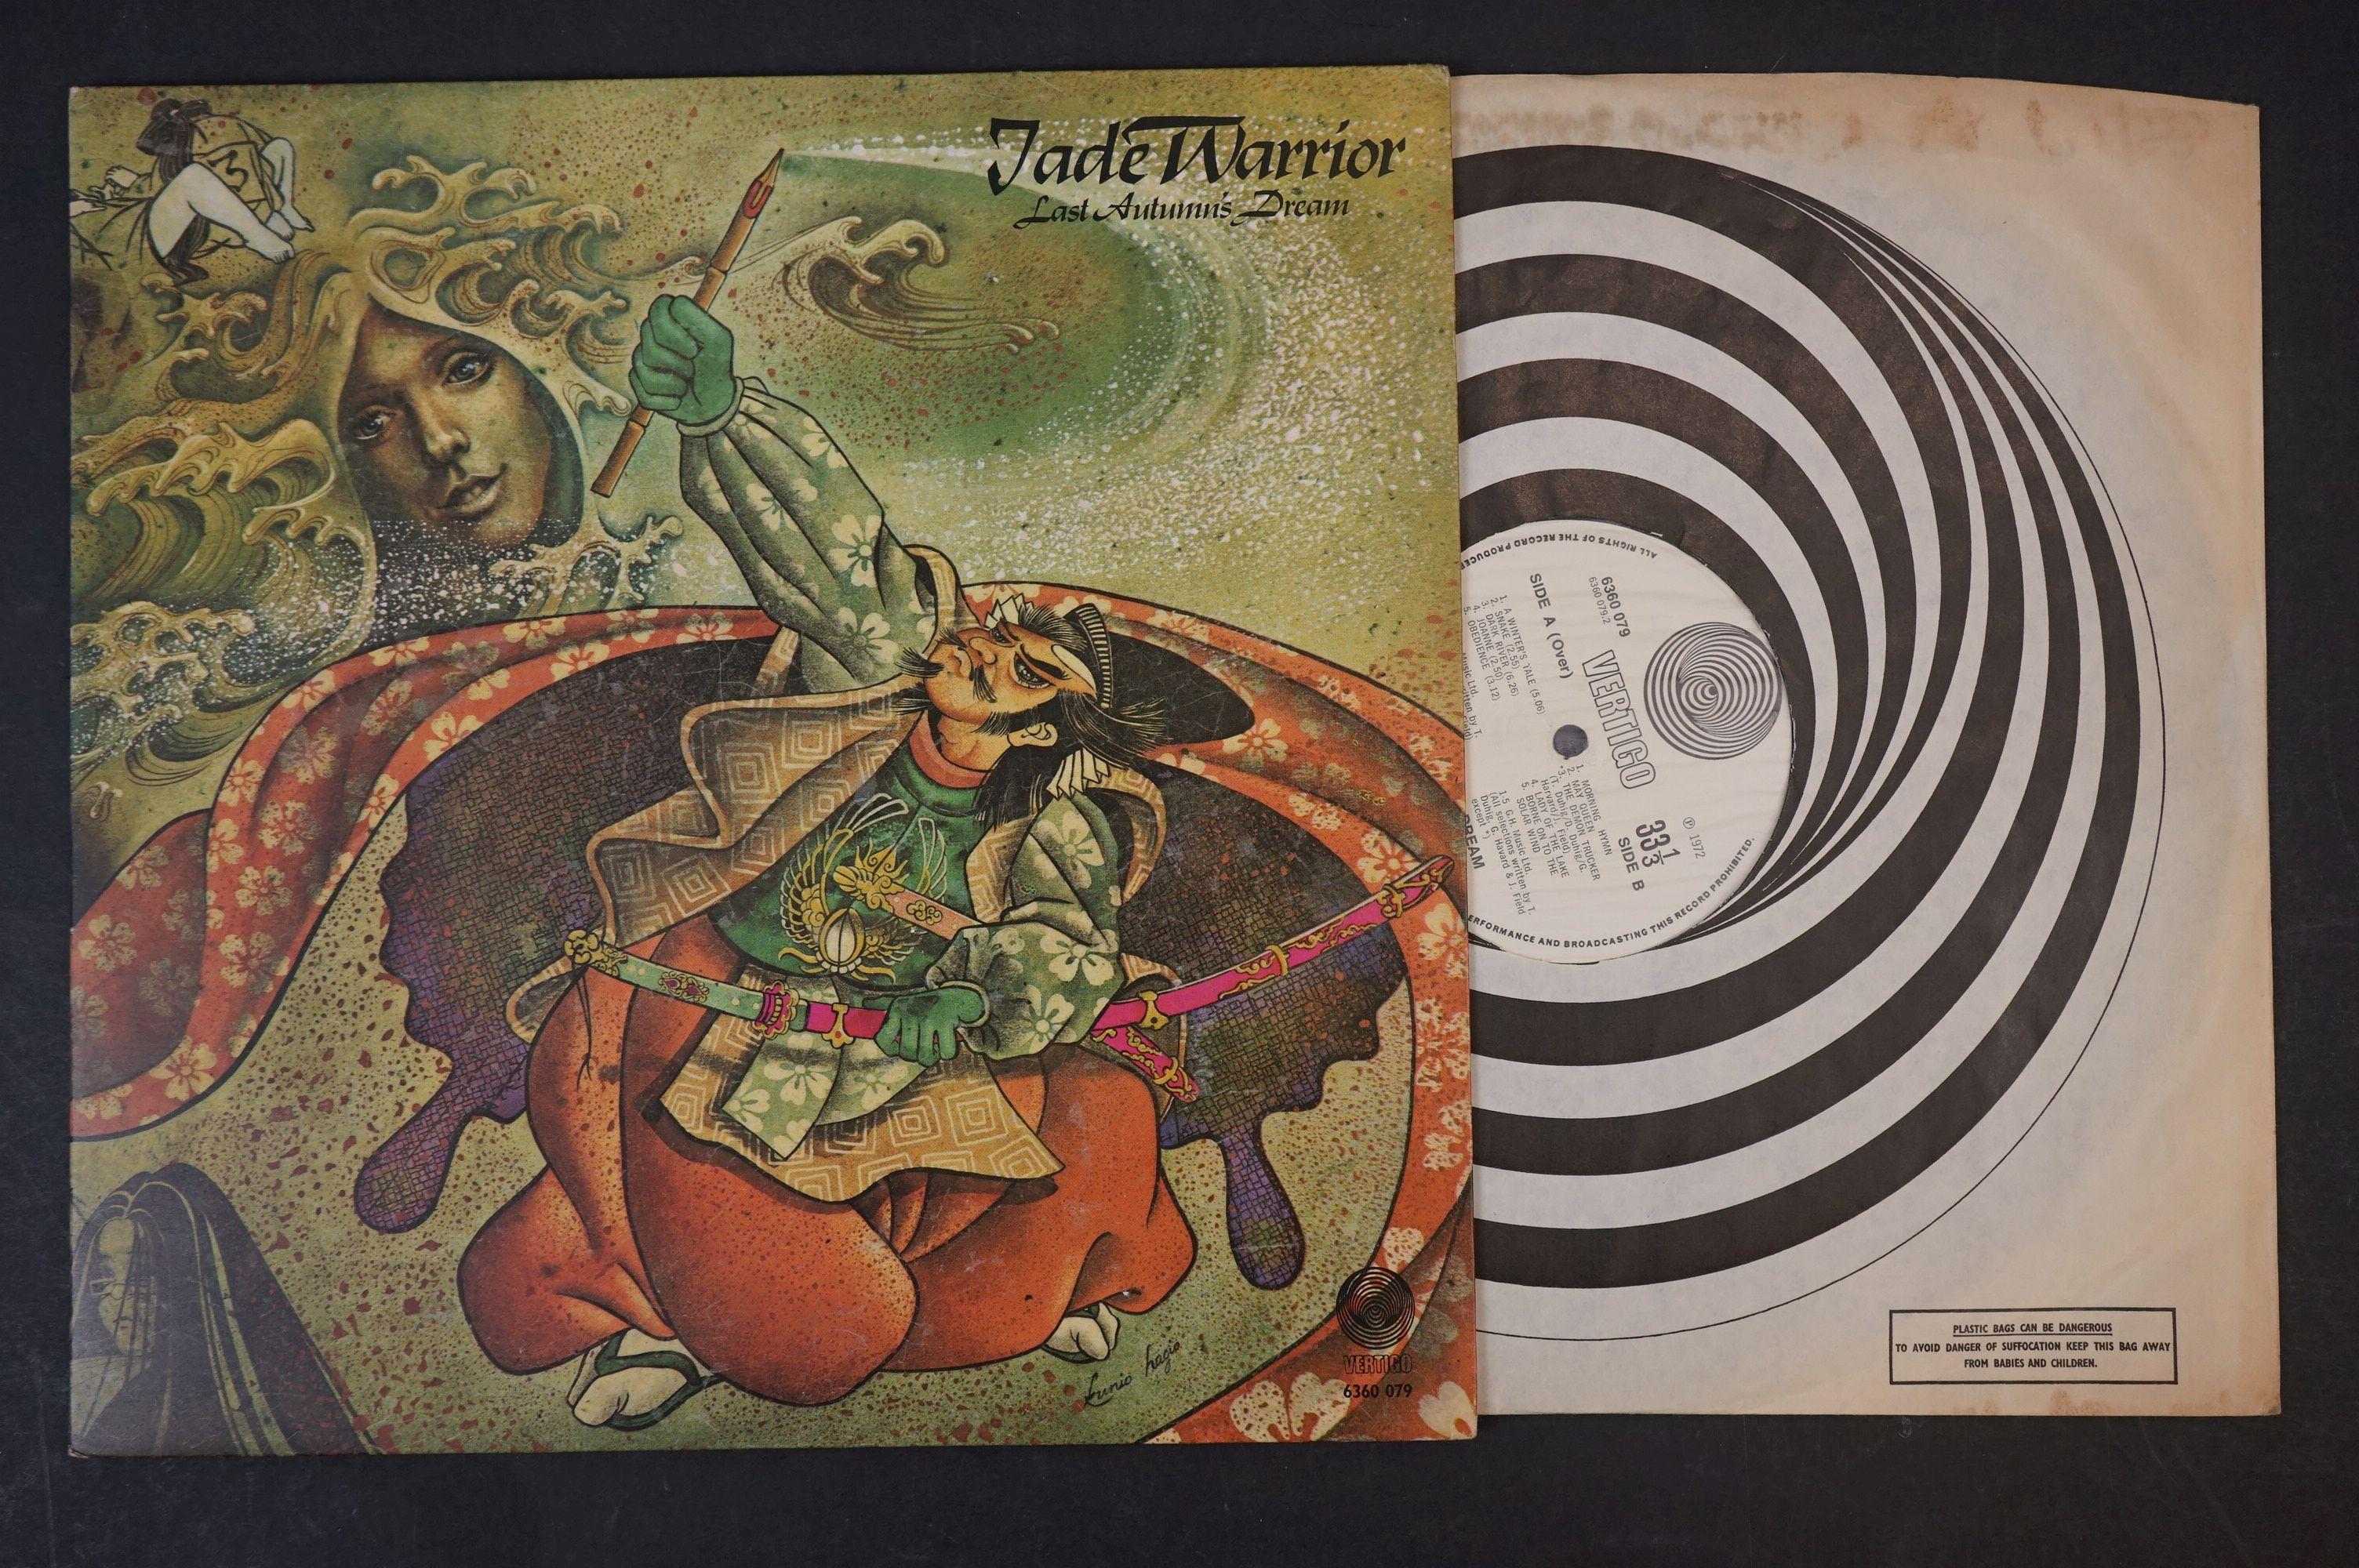 Vinyl - Four Jade Warrior LPs to include Last Autumn Dream LP on Vertigo Deluxe 6360079 gatefold - Image 7 of 9